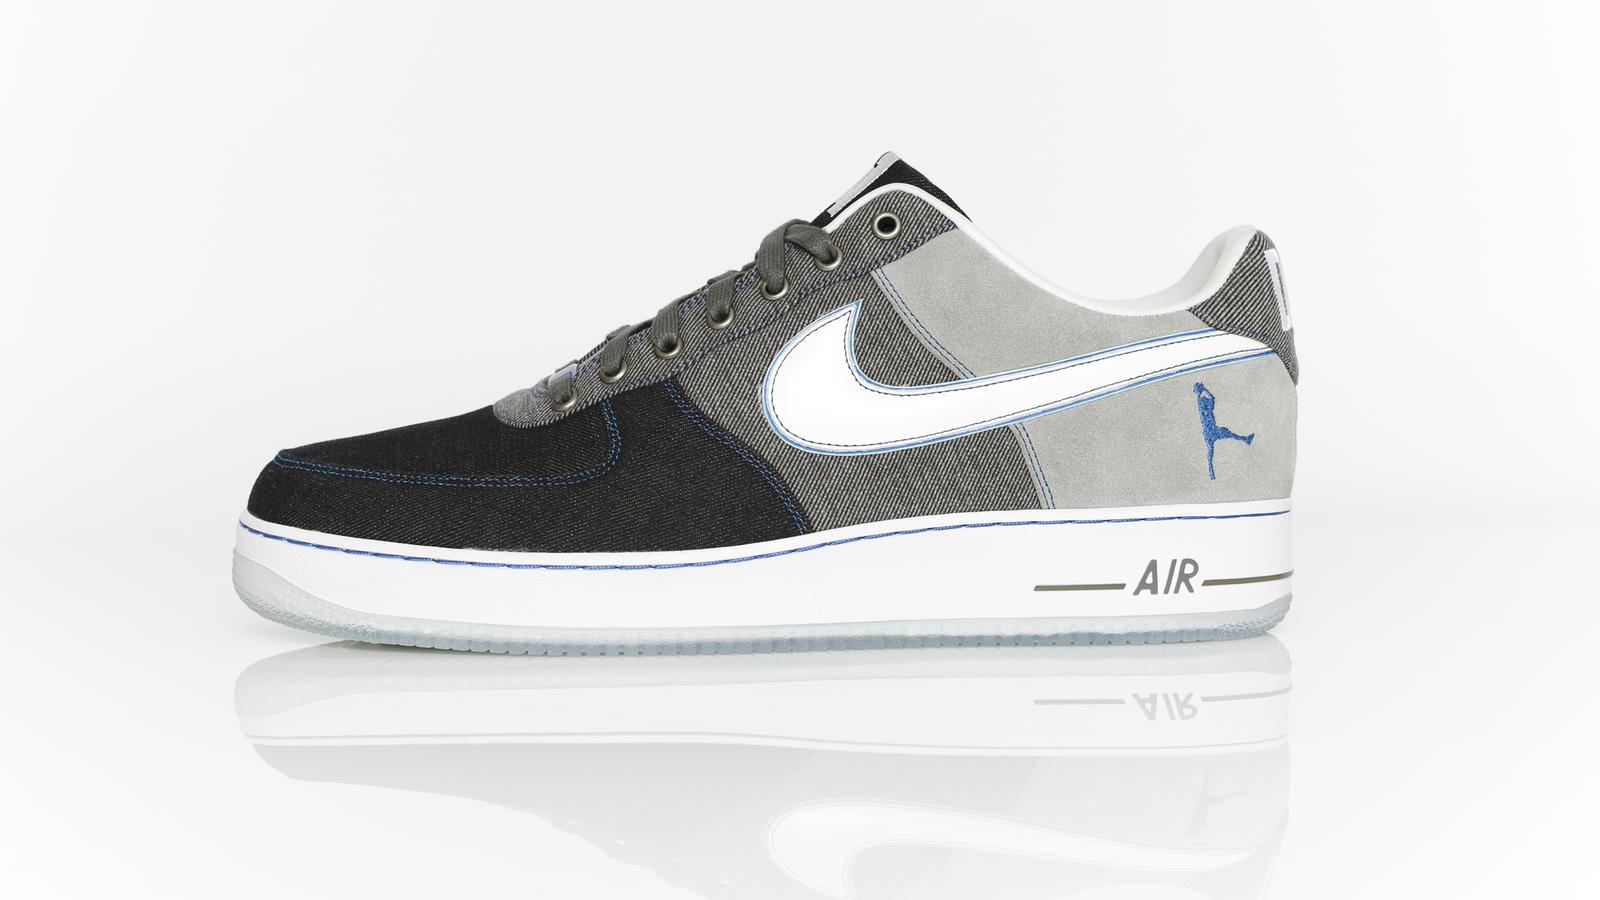 Designs Bespoke Air Dirk Force For Nike Nowitzki News 1 mnwOyv8N0